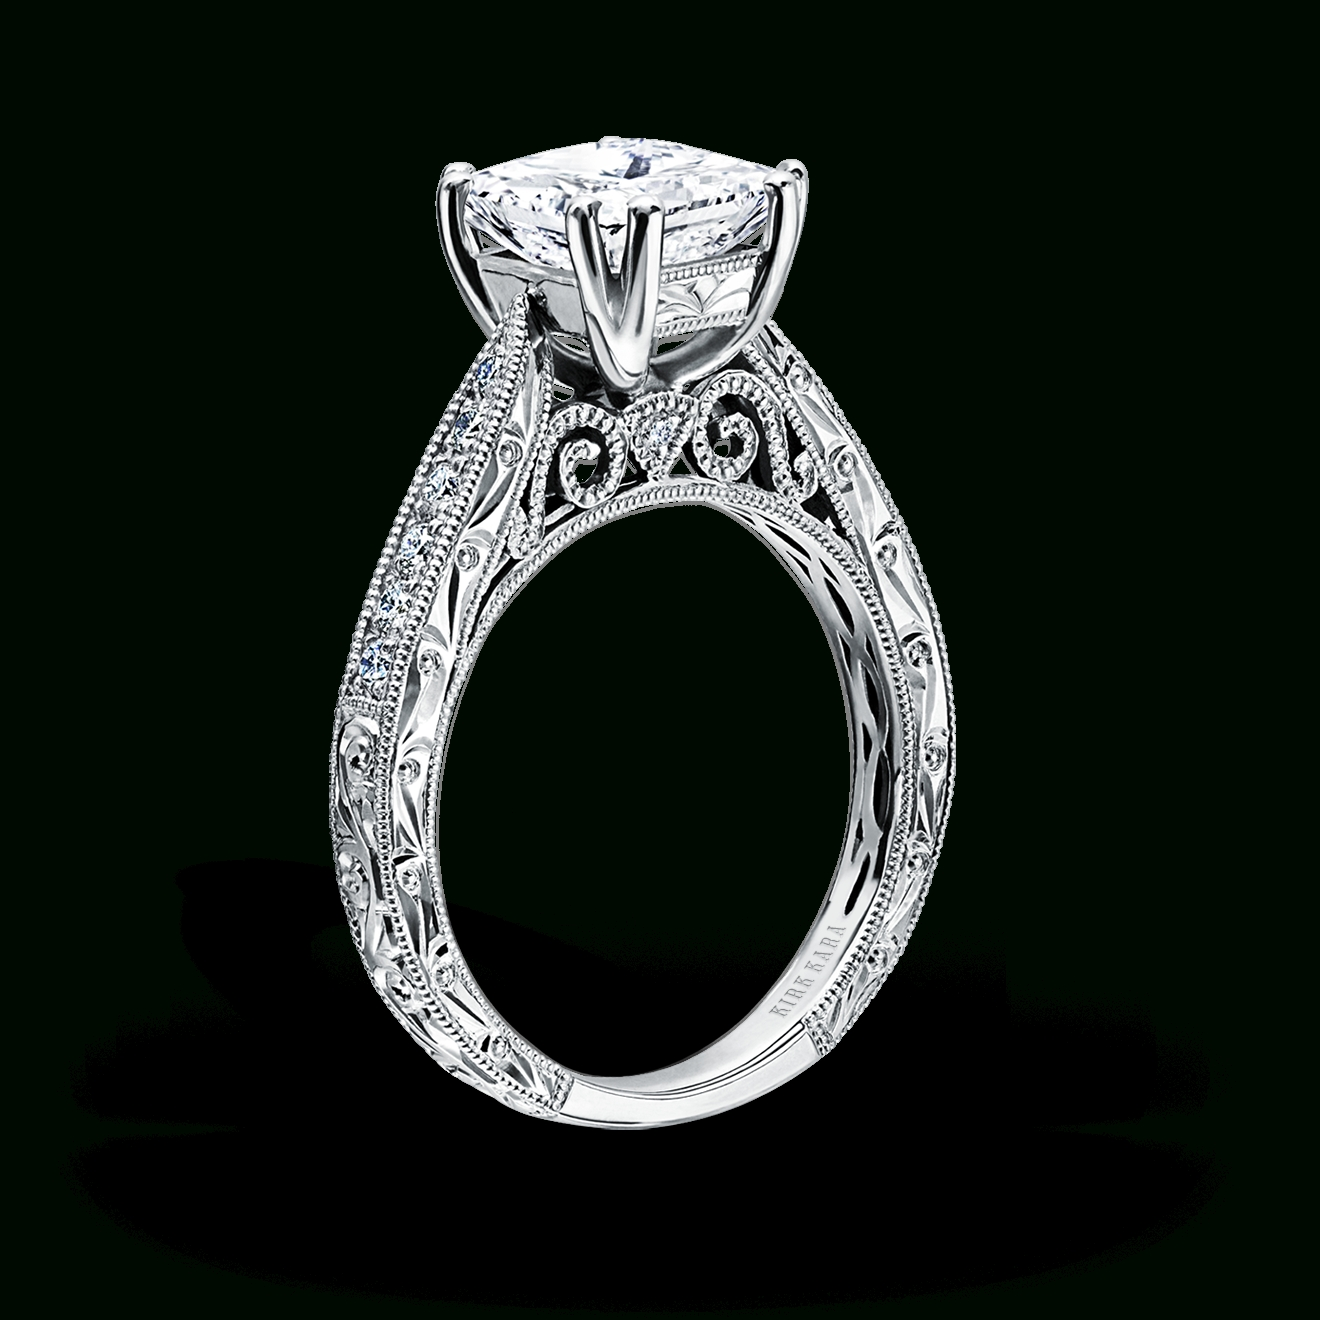 Captivating Designer Diamond Engagement Ringskirk Kara Inside Diamond Wedding Rings (View 8 of 15)